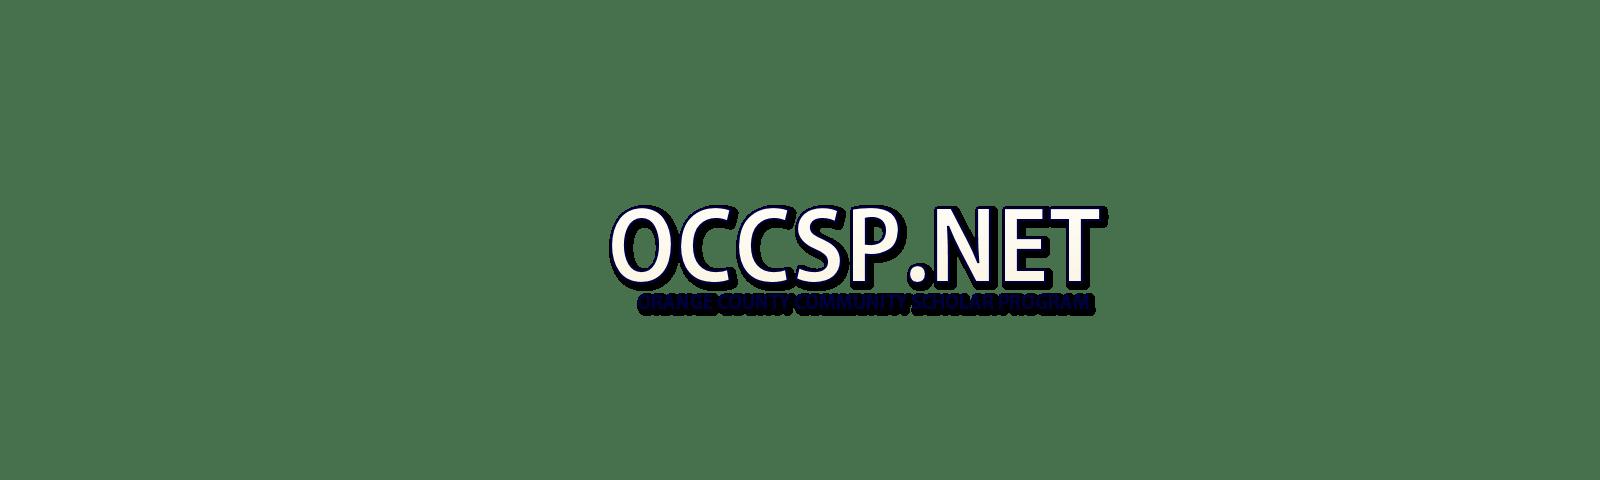 occsp-logo-new